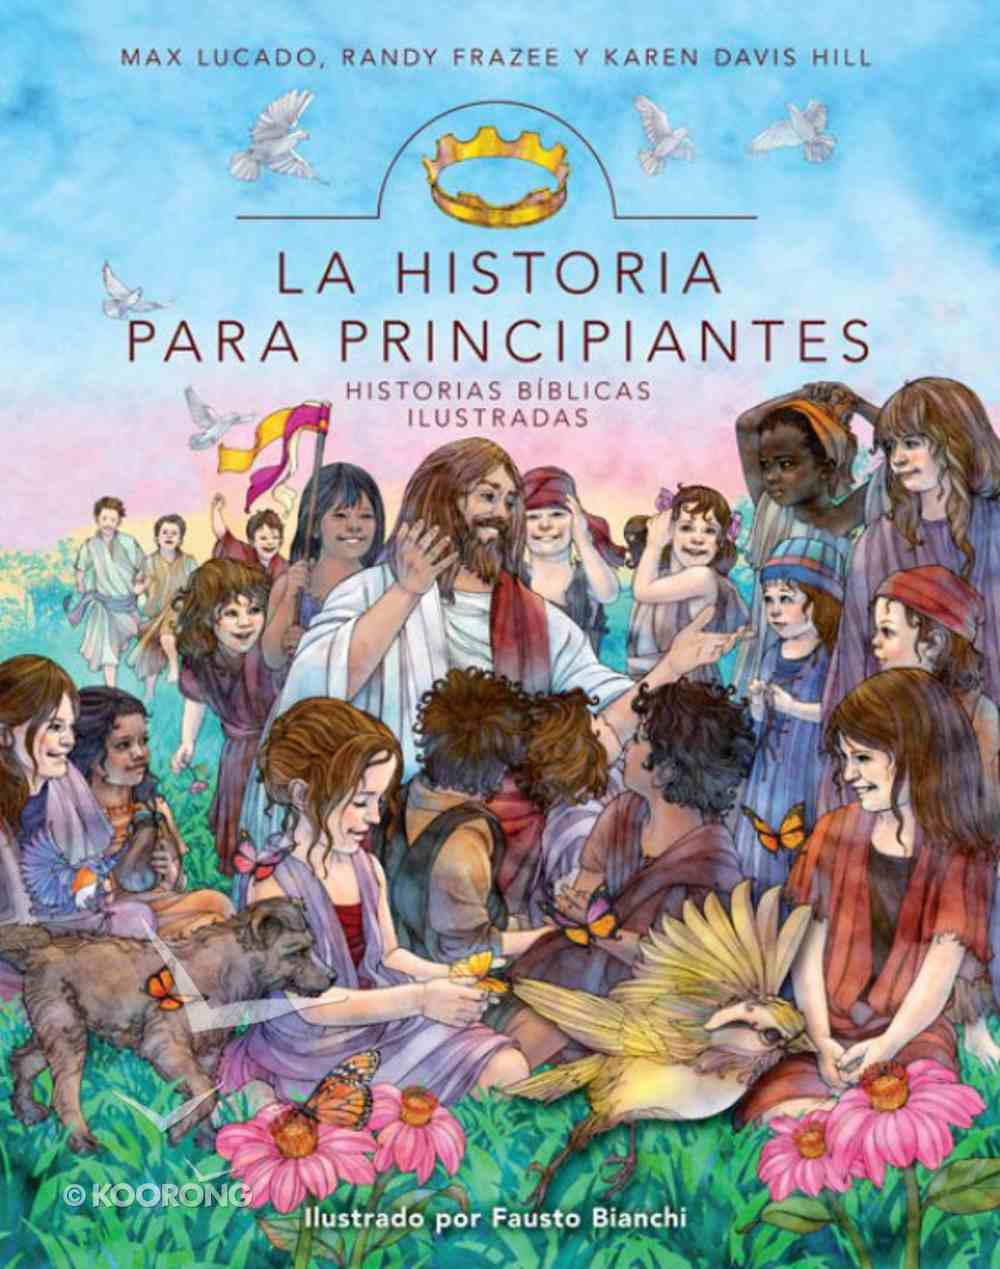 Historia Para Principiante (Spanish) (Spa) (Story For Children, Storybook Bible) (The Story Series) eBook